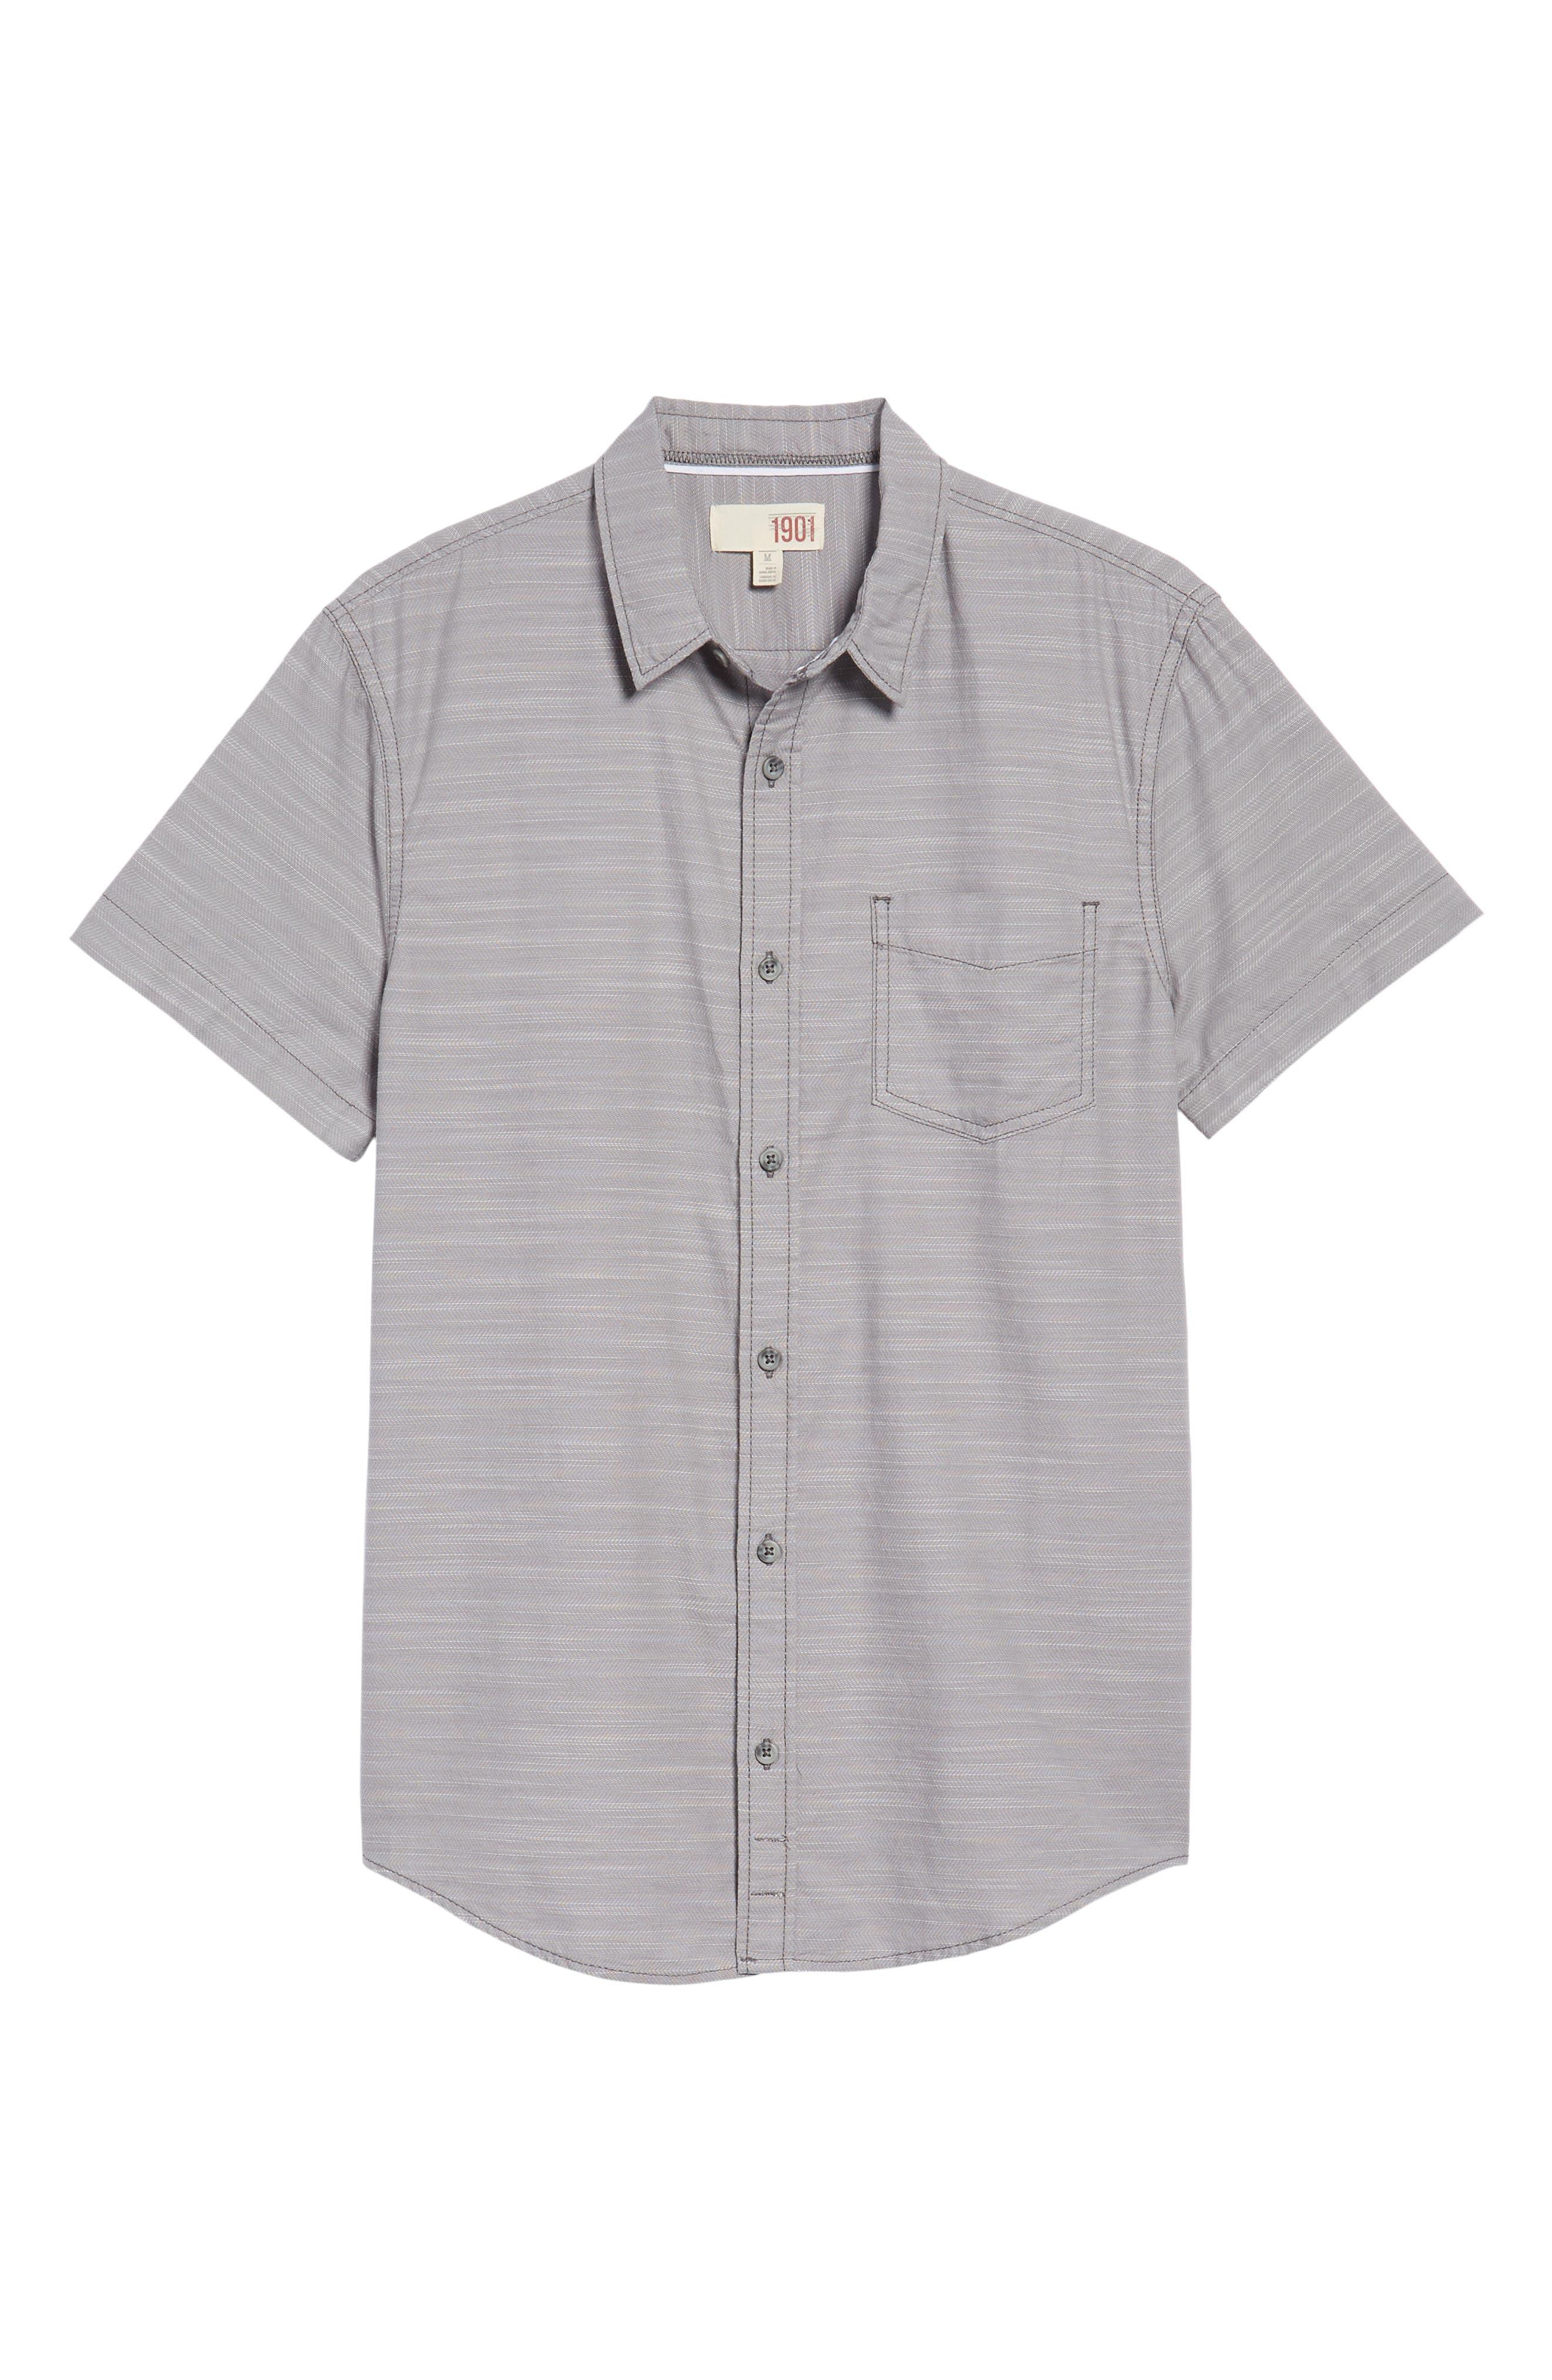 Herringbone Chambray Shirt,                             Alternate thumbnail 6, color,                             Grey Filigree Herringbone